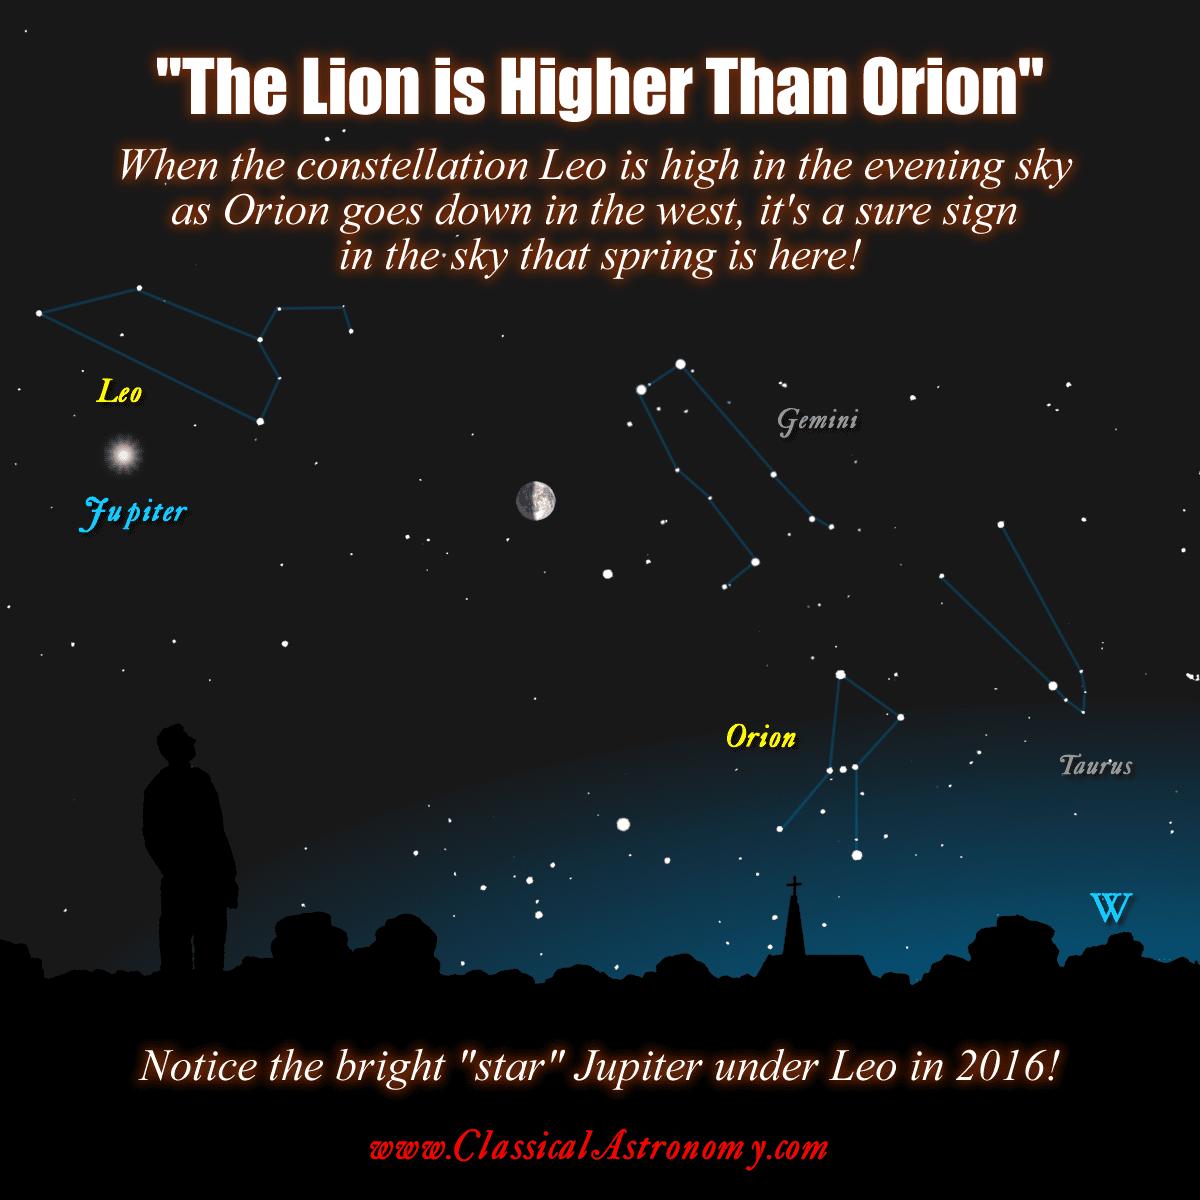 2016-4-LionHigherThanOrion